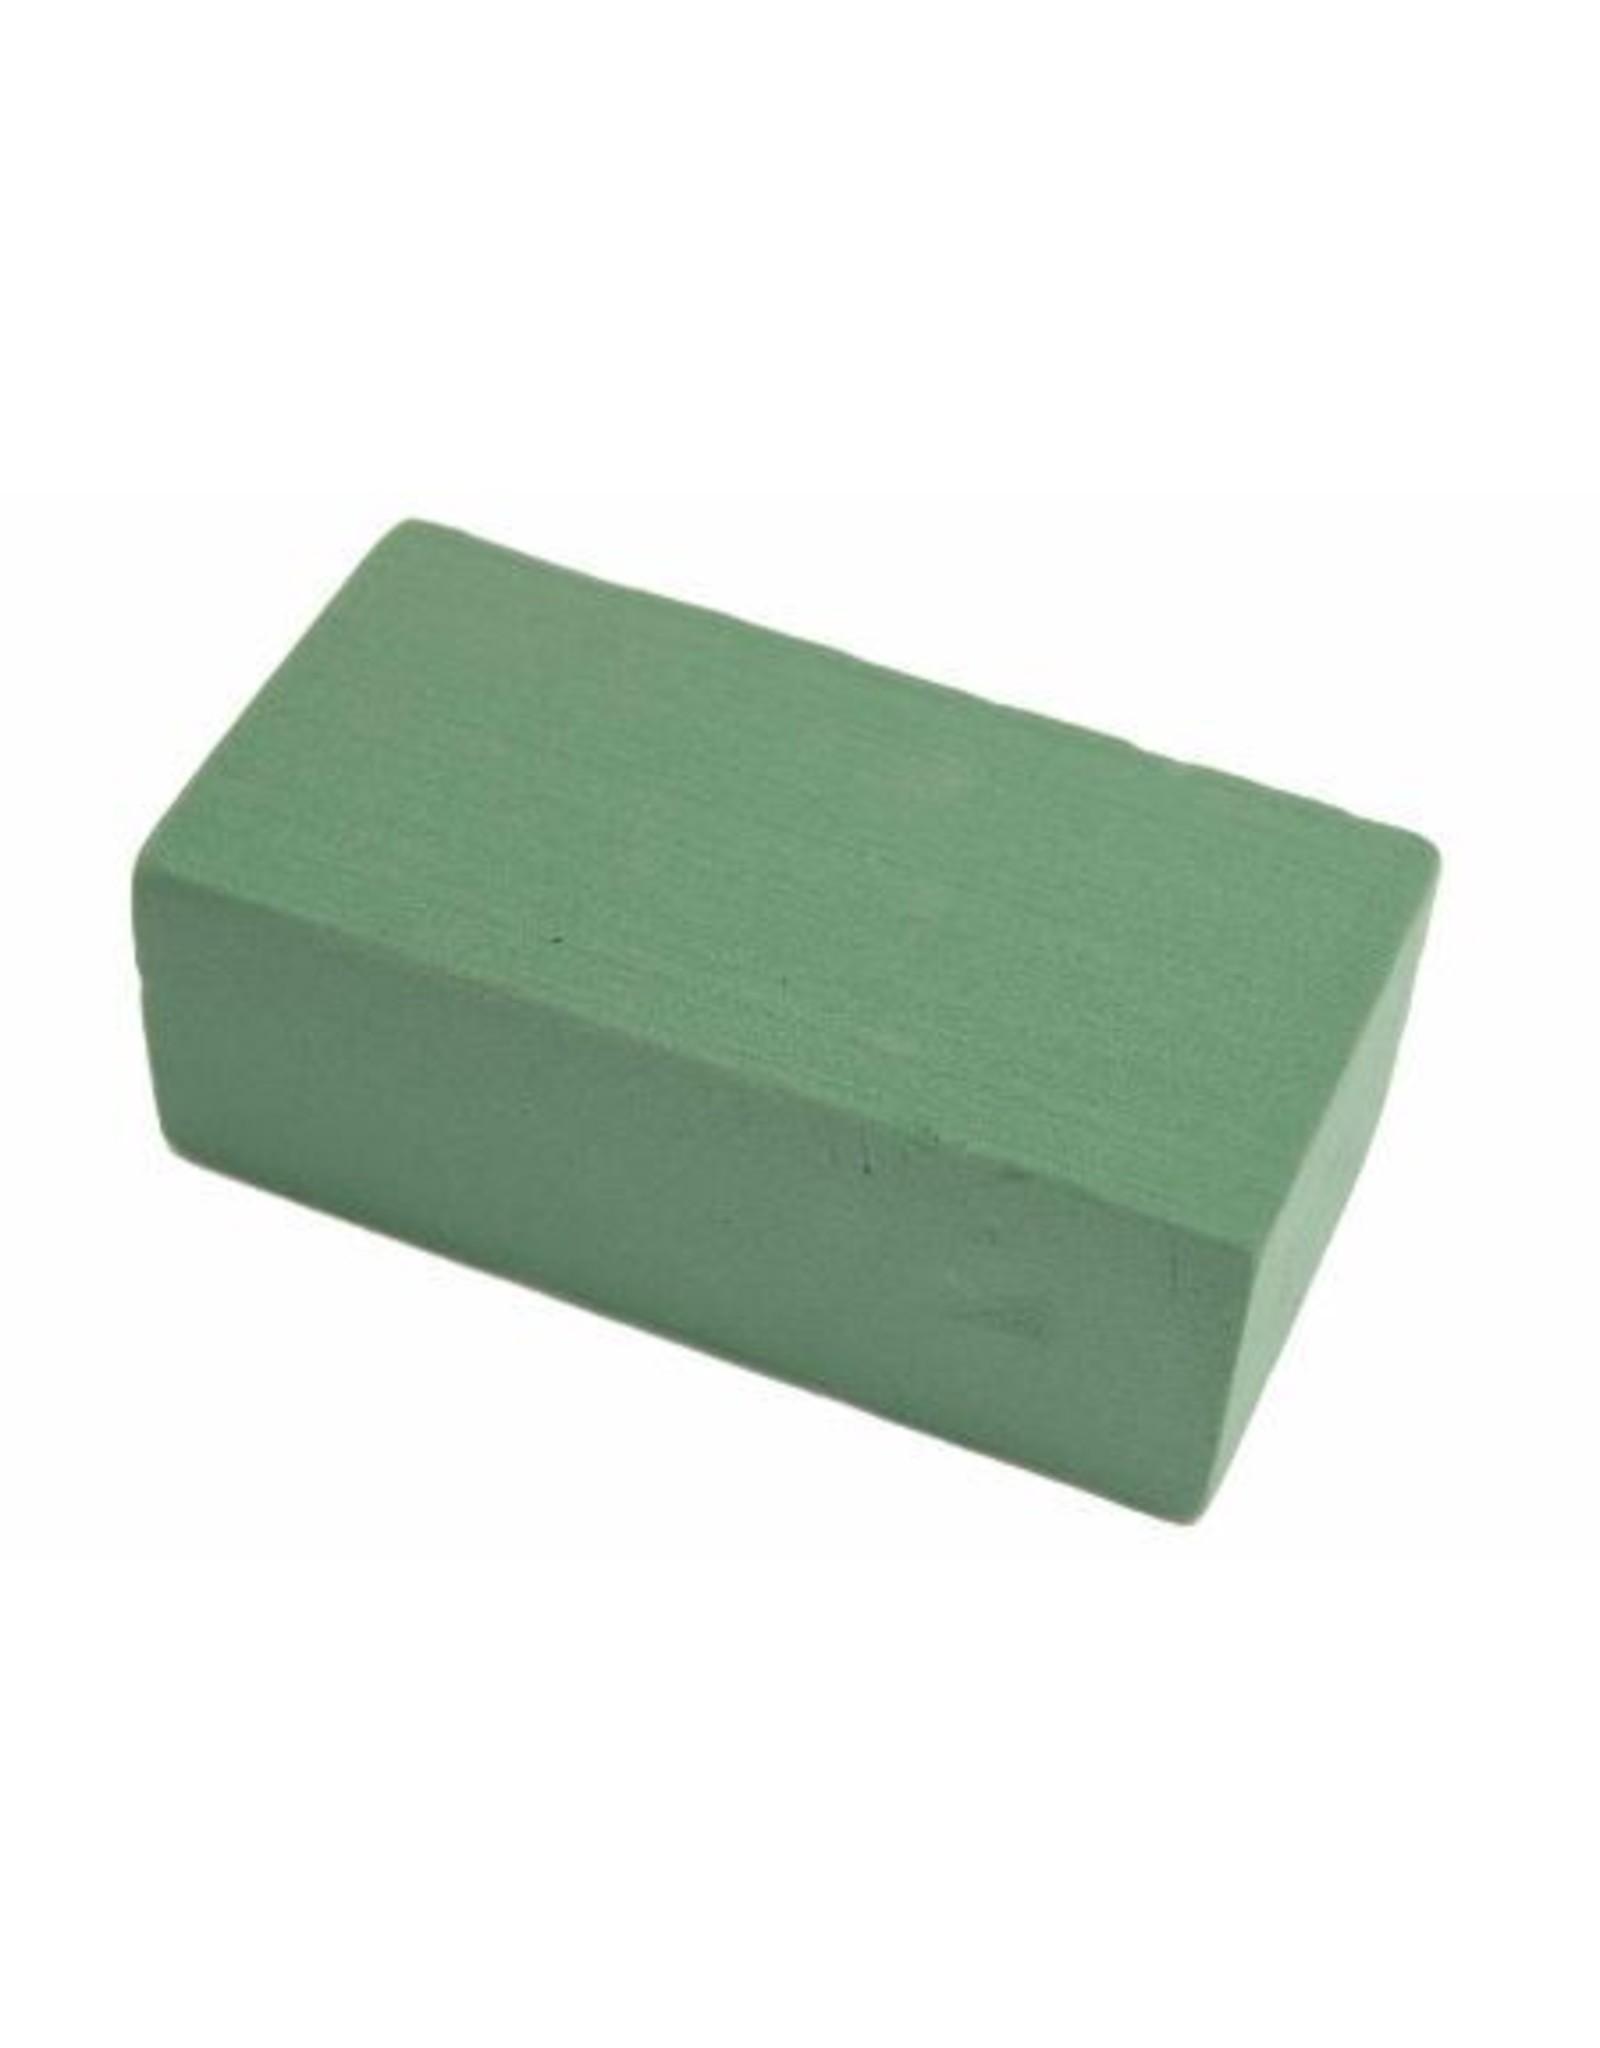 HD Basic Brick Foam ↑20.0 Ø10.0 ↑7.5 (x 20)